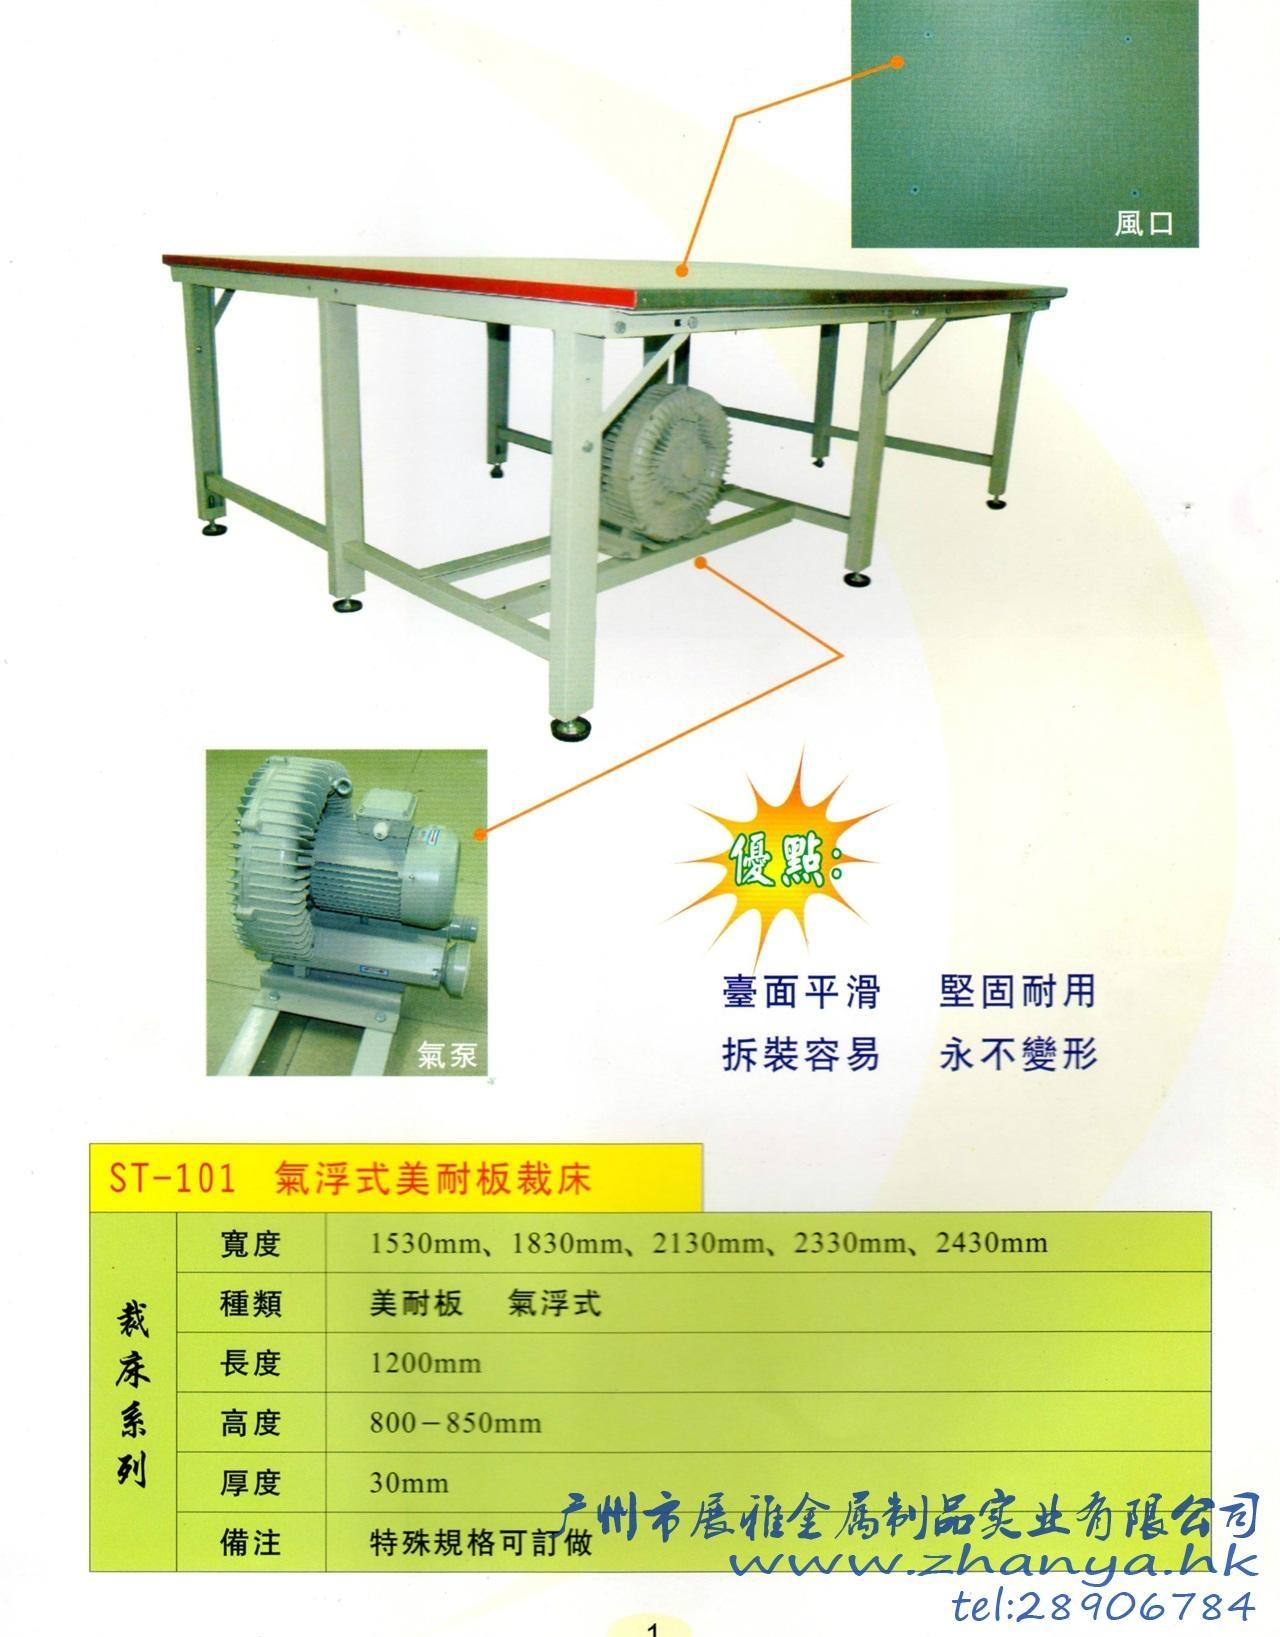 ST-101 气浮式裁床 5